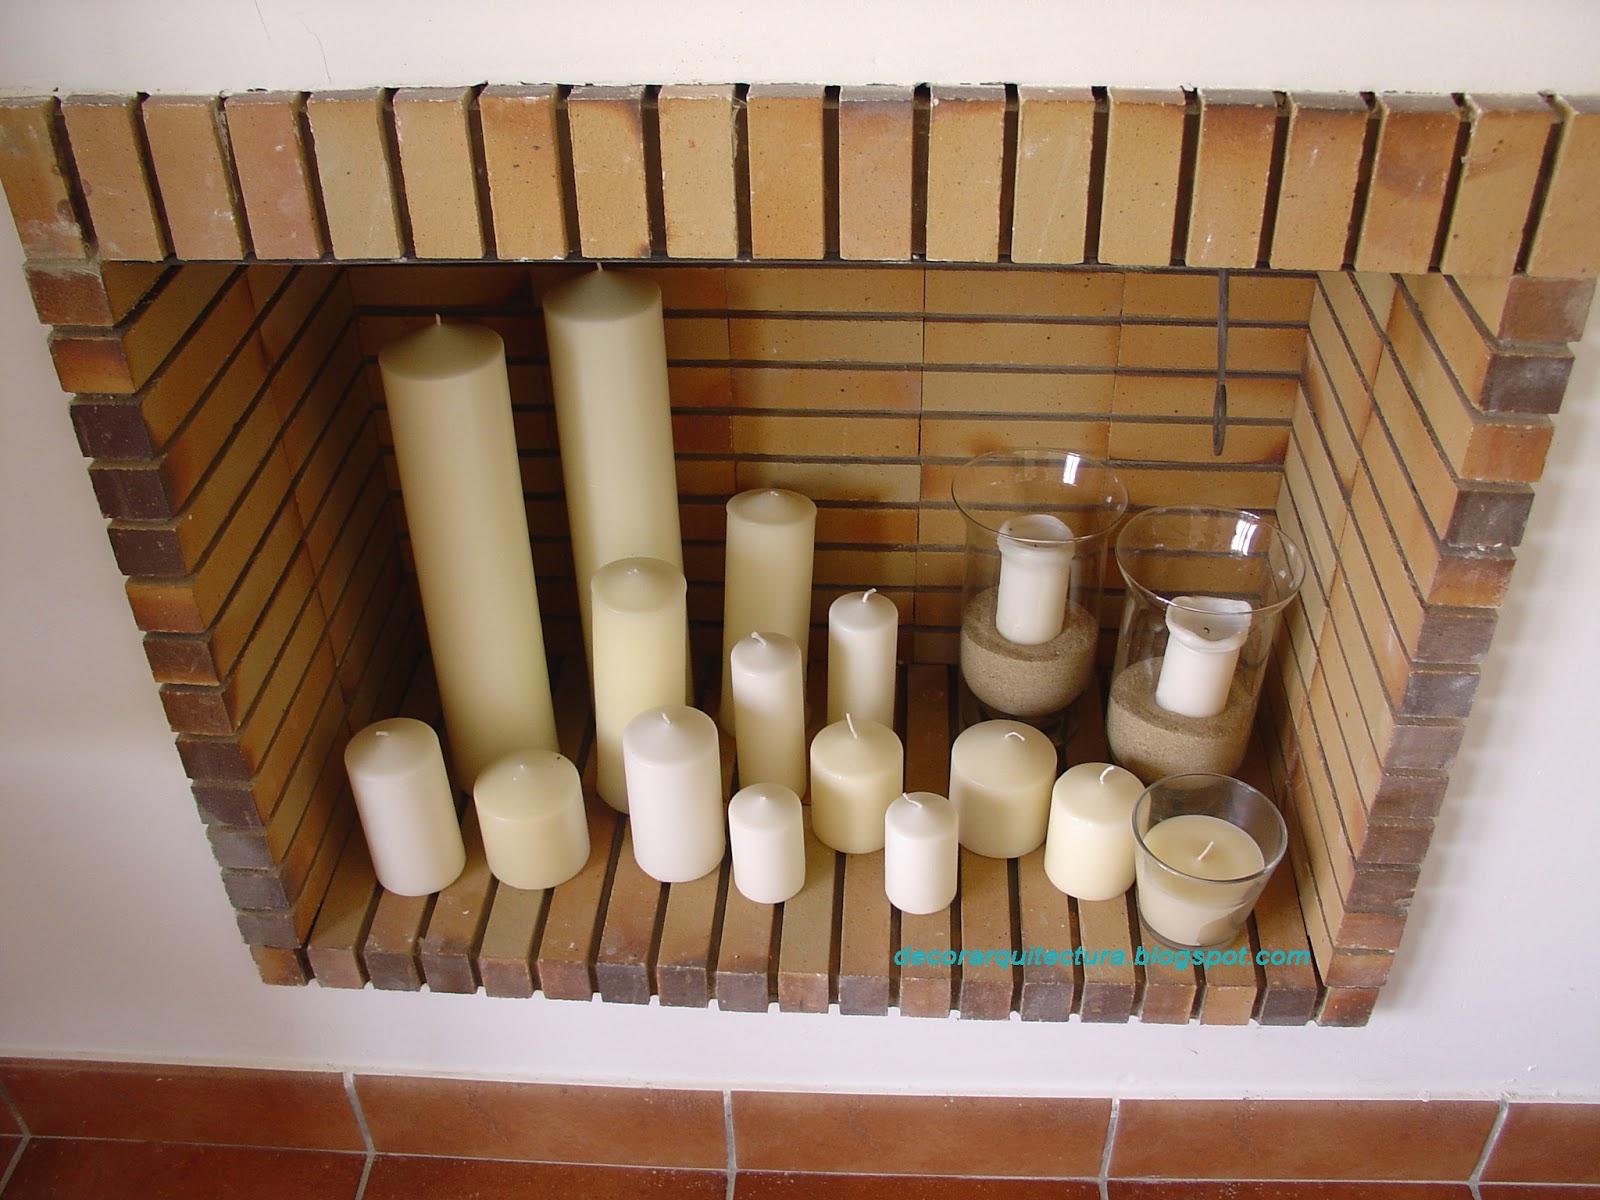 Decoraci n y arquitectura chimenea decorada decorating a - Calefaccion con velas ...